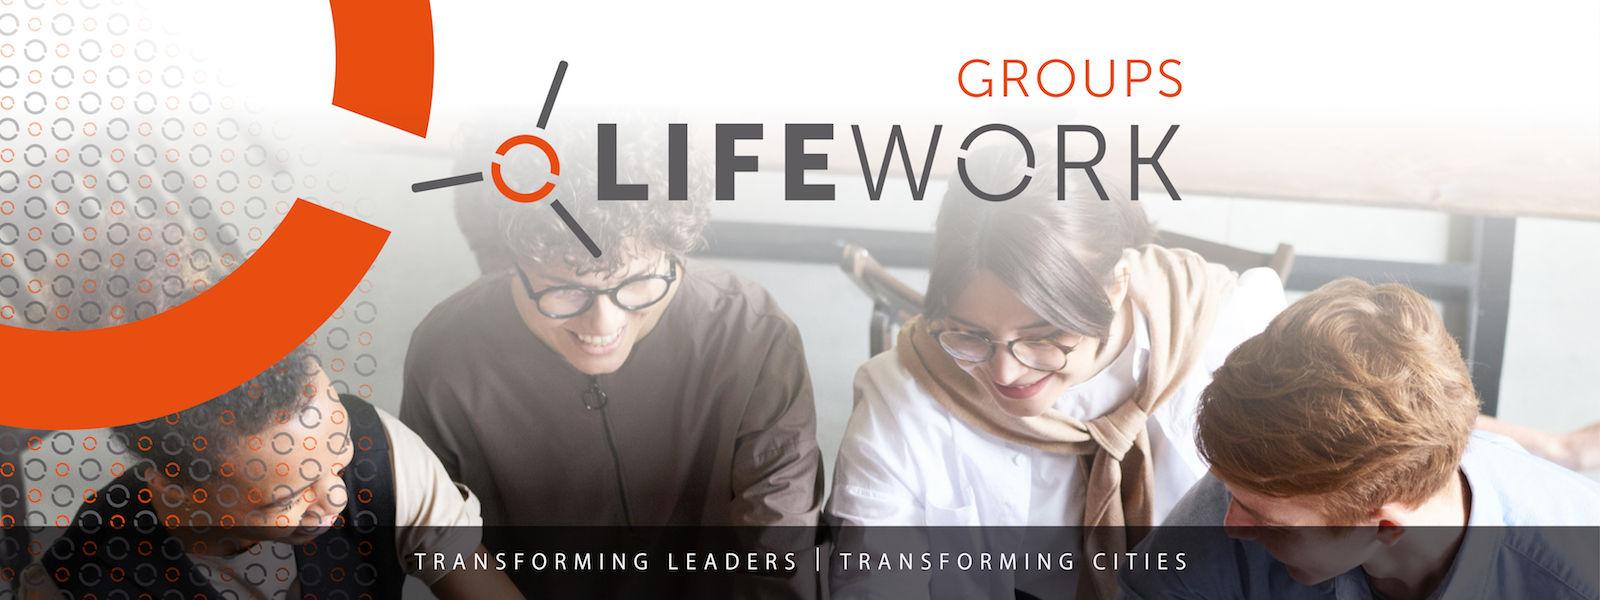 Lifework Groups